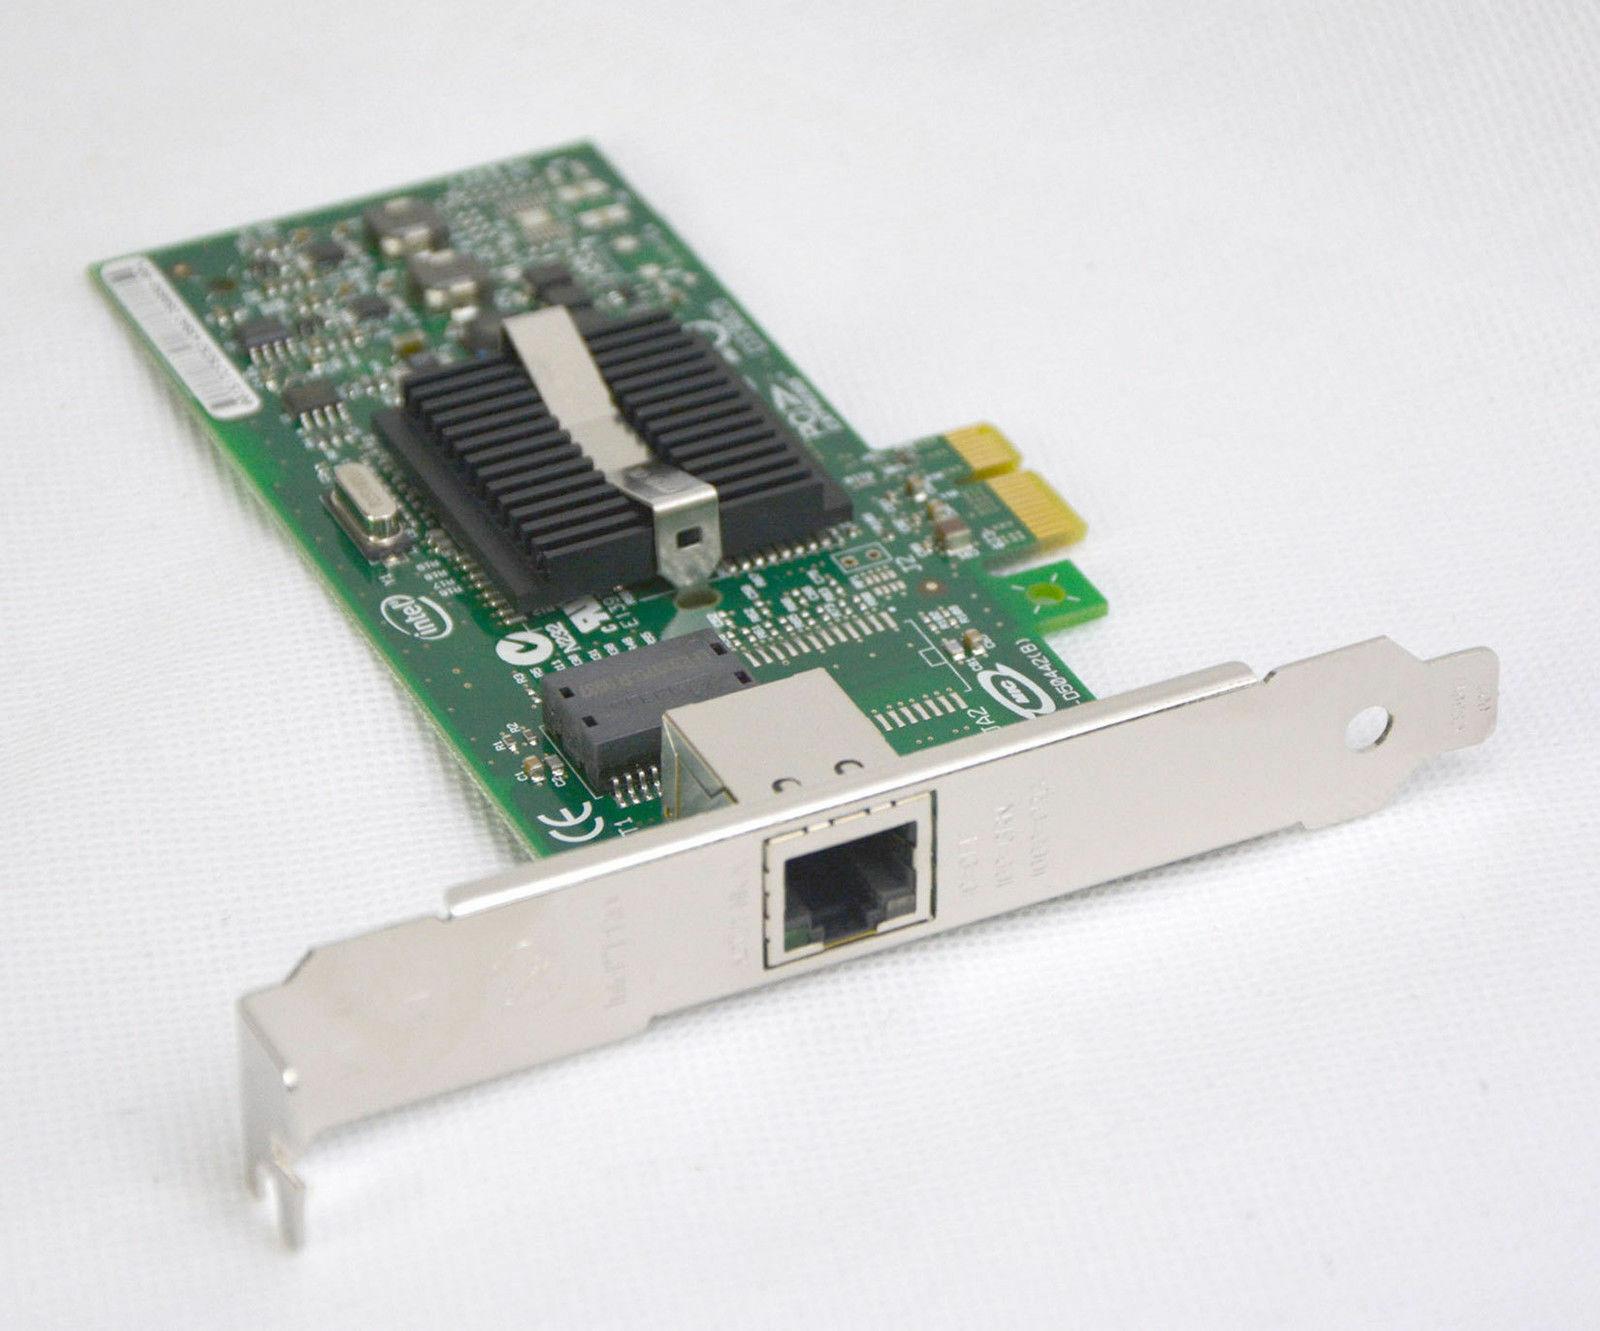 Intel pro/1000pt gigabit lan ethernet card pcie 4x expi9400ptg2p20 #a70